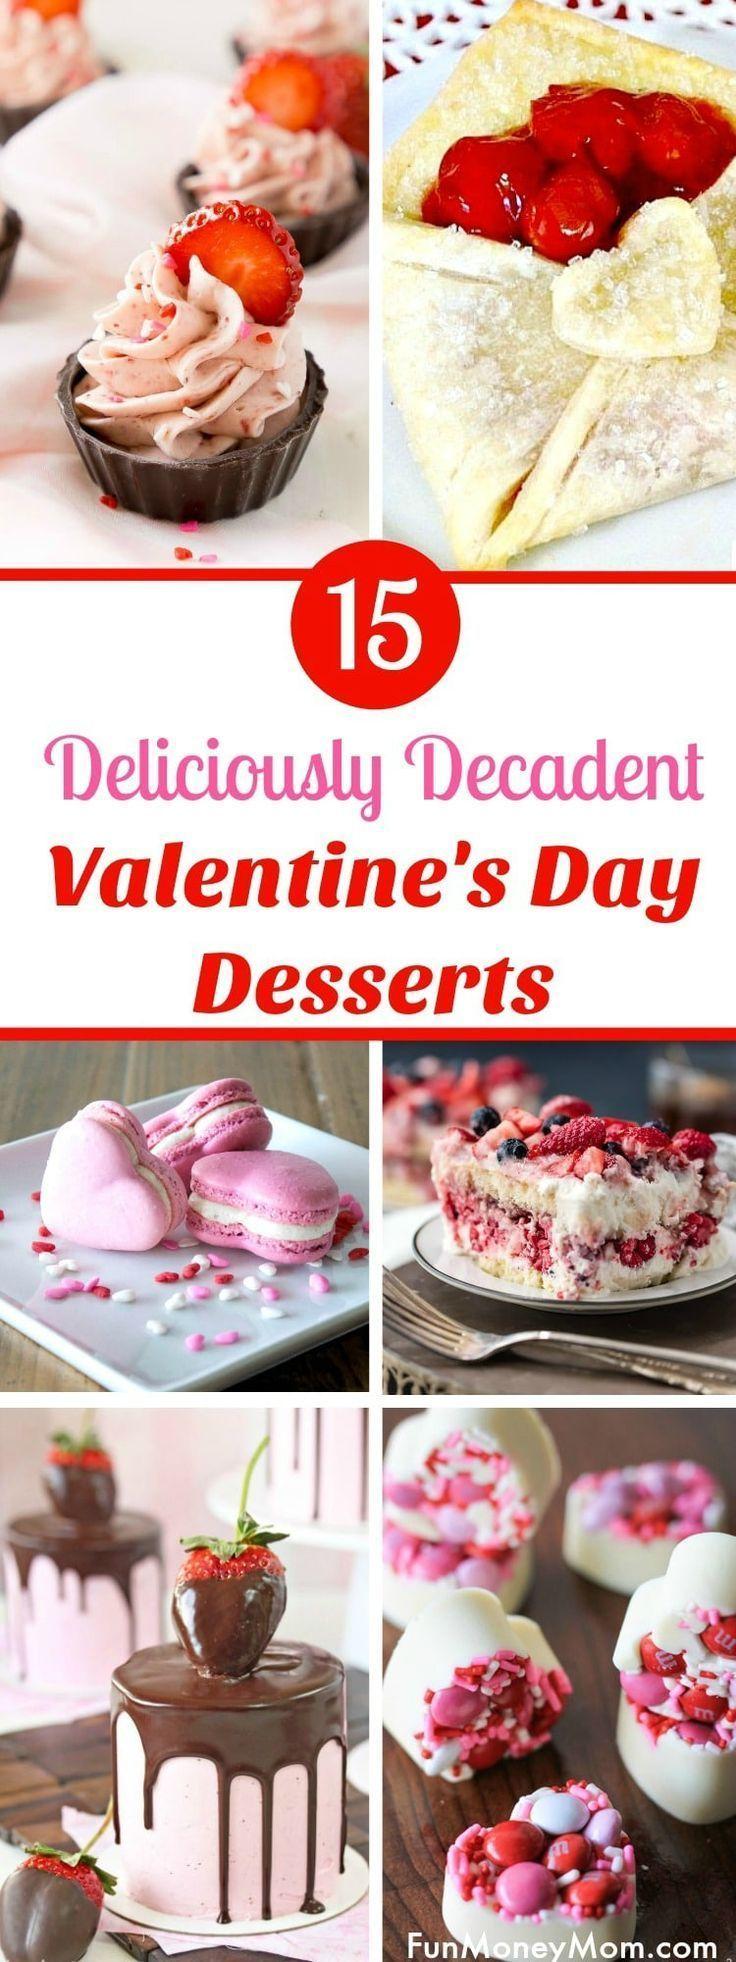 15 Deliciously Decadent Valentine's Day Desserts 15 Deliciously Decadent Valentine's Day Desserts,